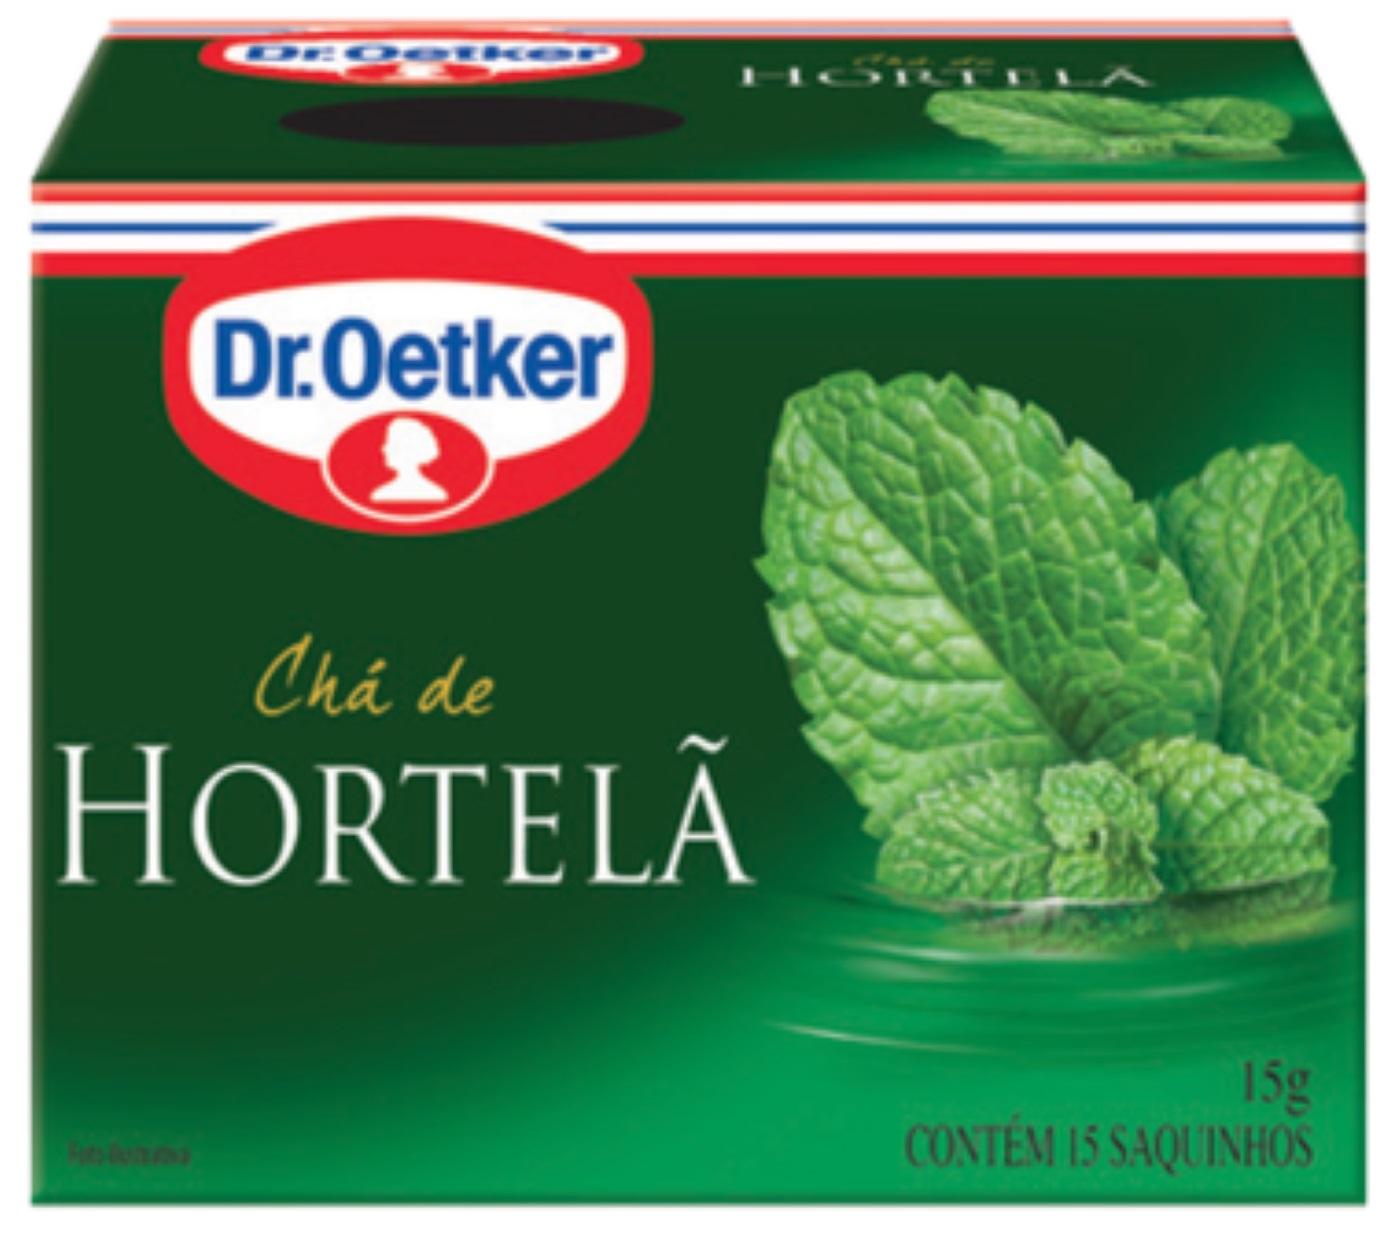 CHÁ DE HORTELÃ - DR. OETKER